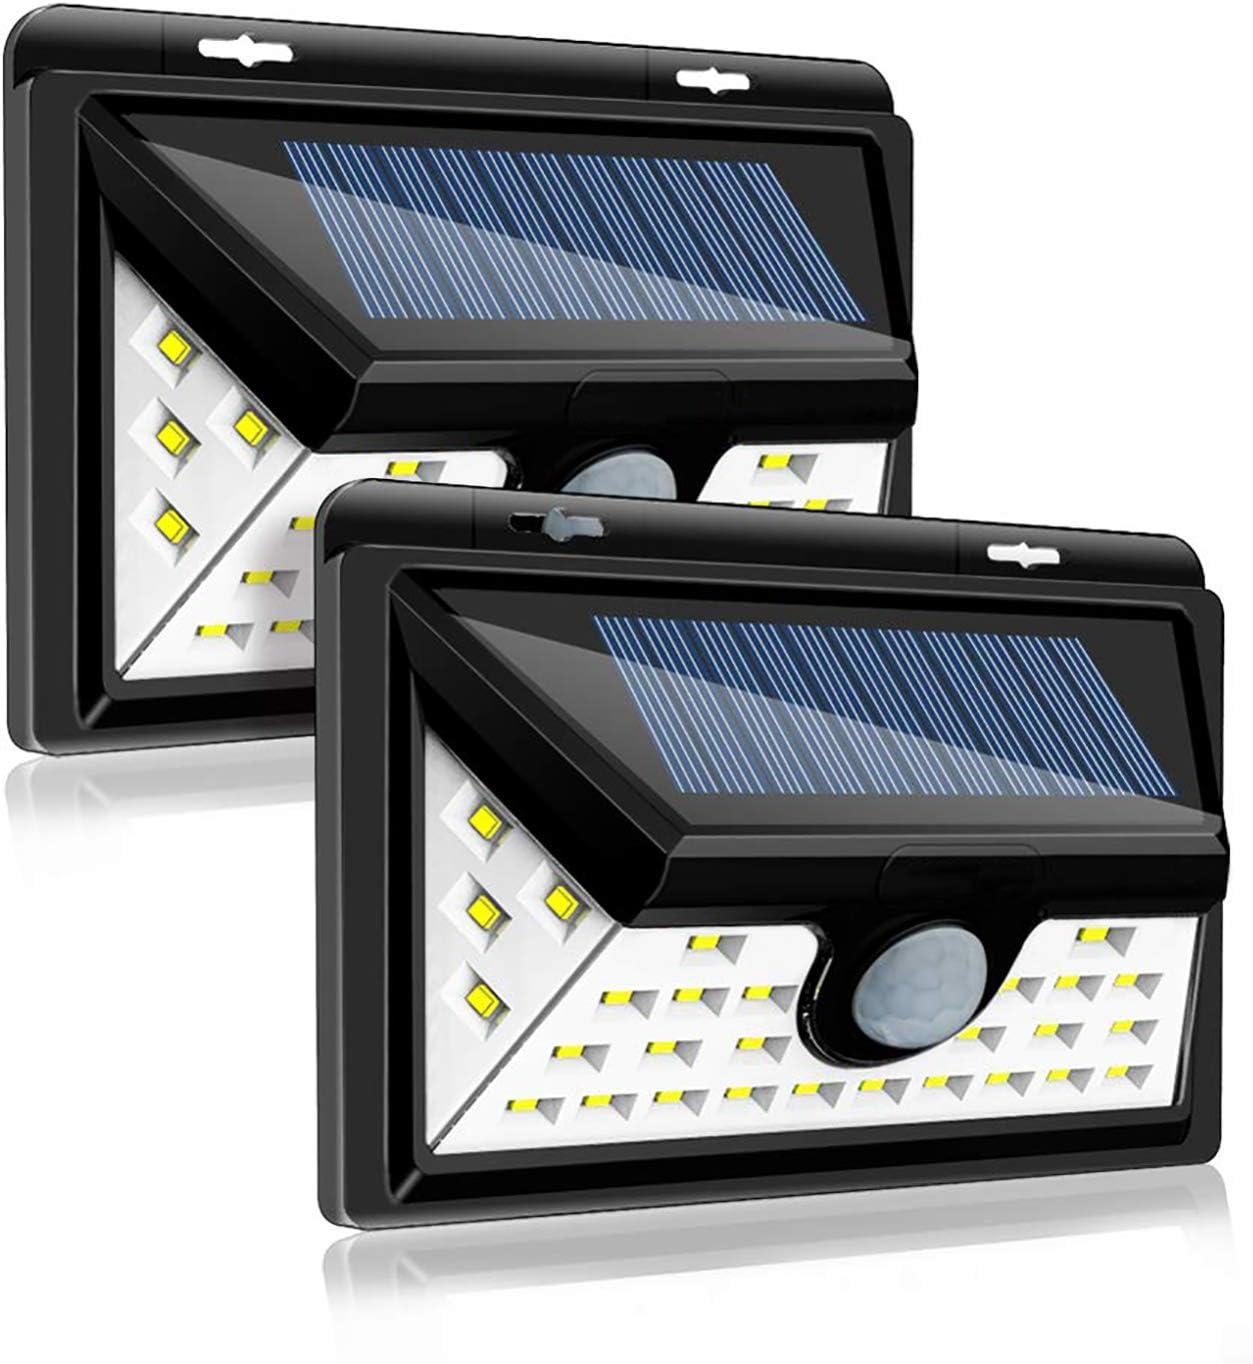 Pack of 4 Perkisboby Solar Lights Outdoor,32 LED Wireless Waterproof Security Solar Motion Sensor Lights